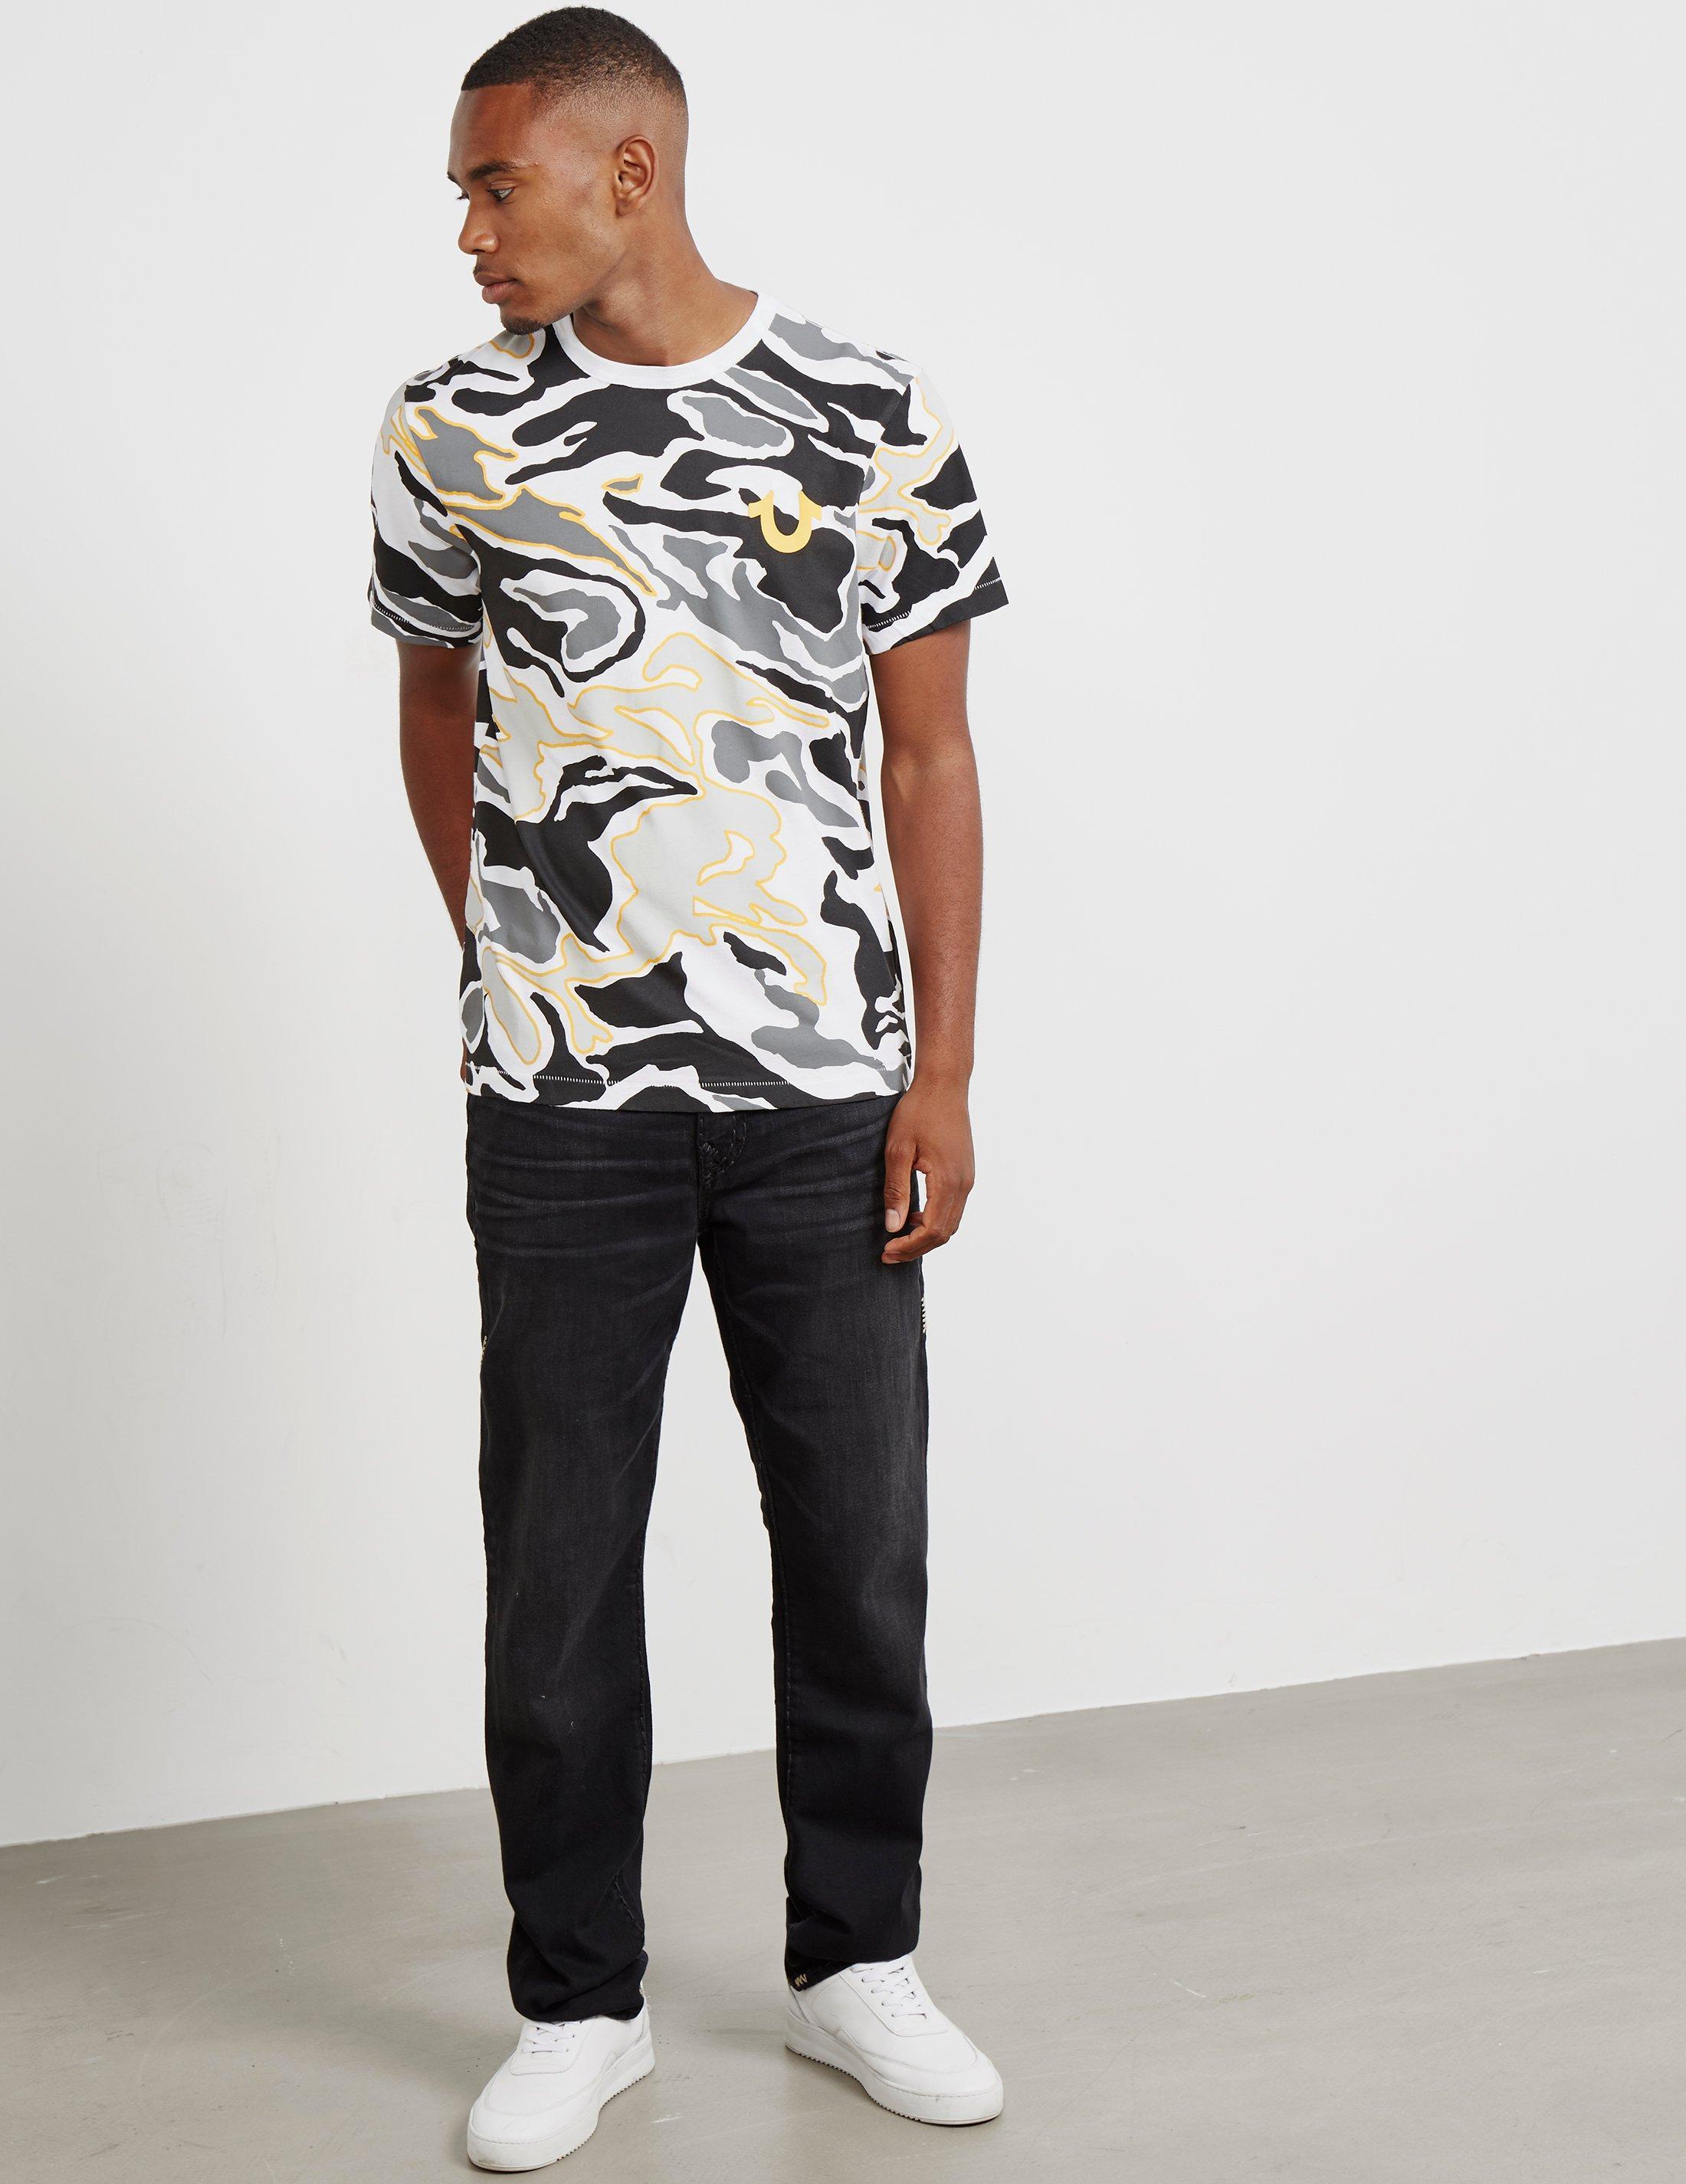 03bdc7b53 Lyst - True Religion Geno Straight Jeans Black in Black for Men - Save 14%